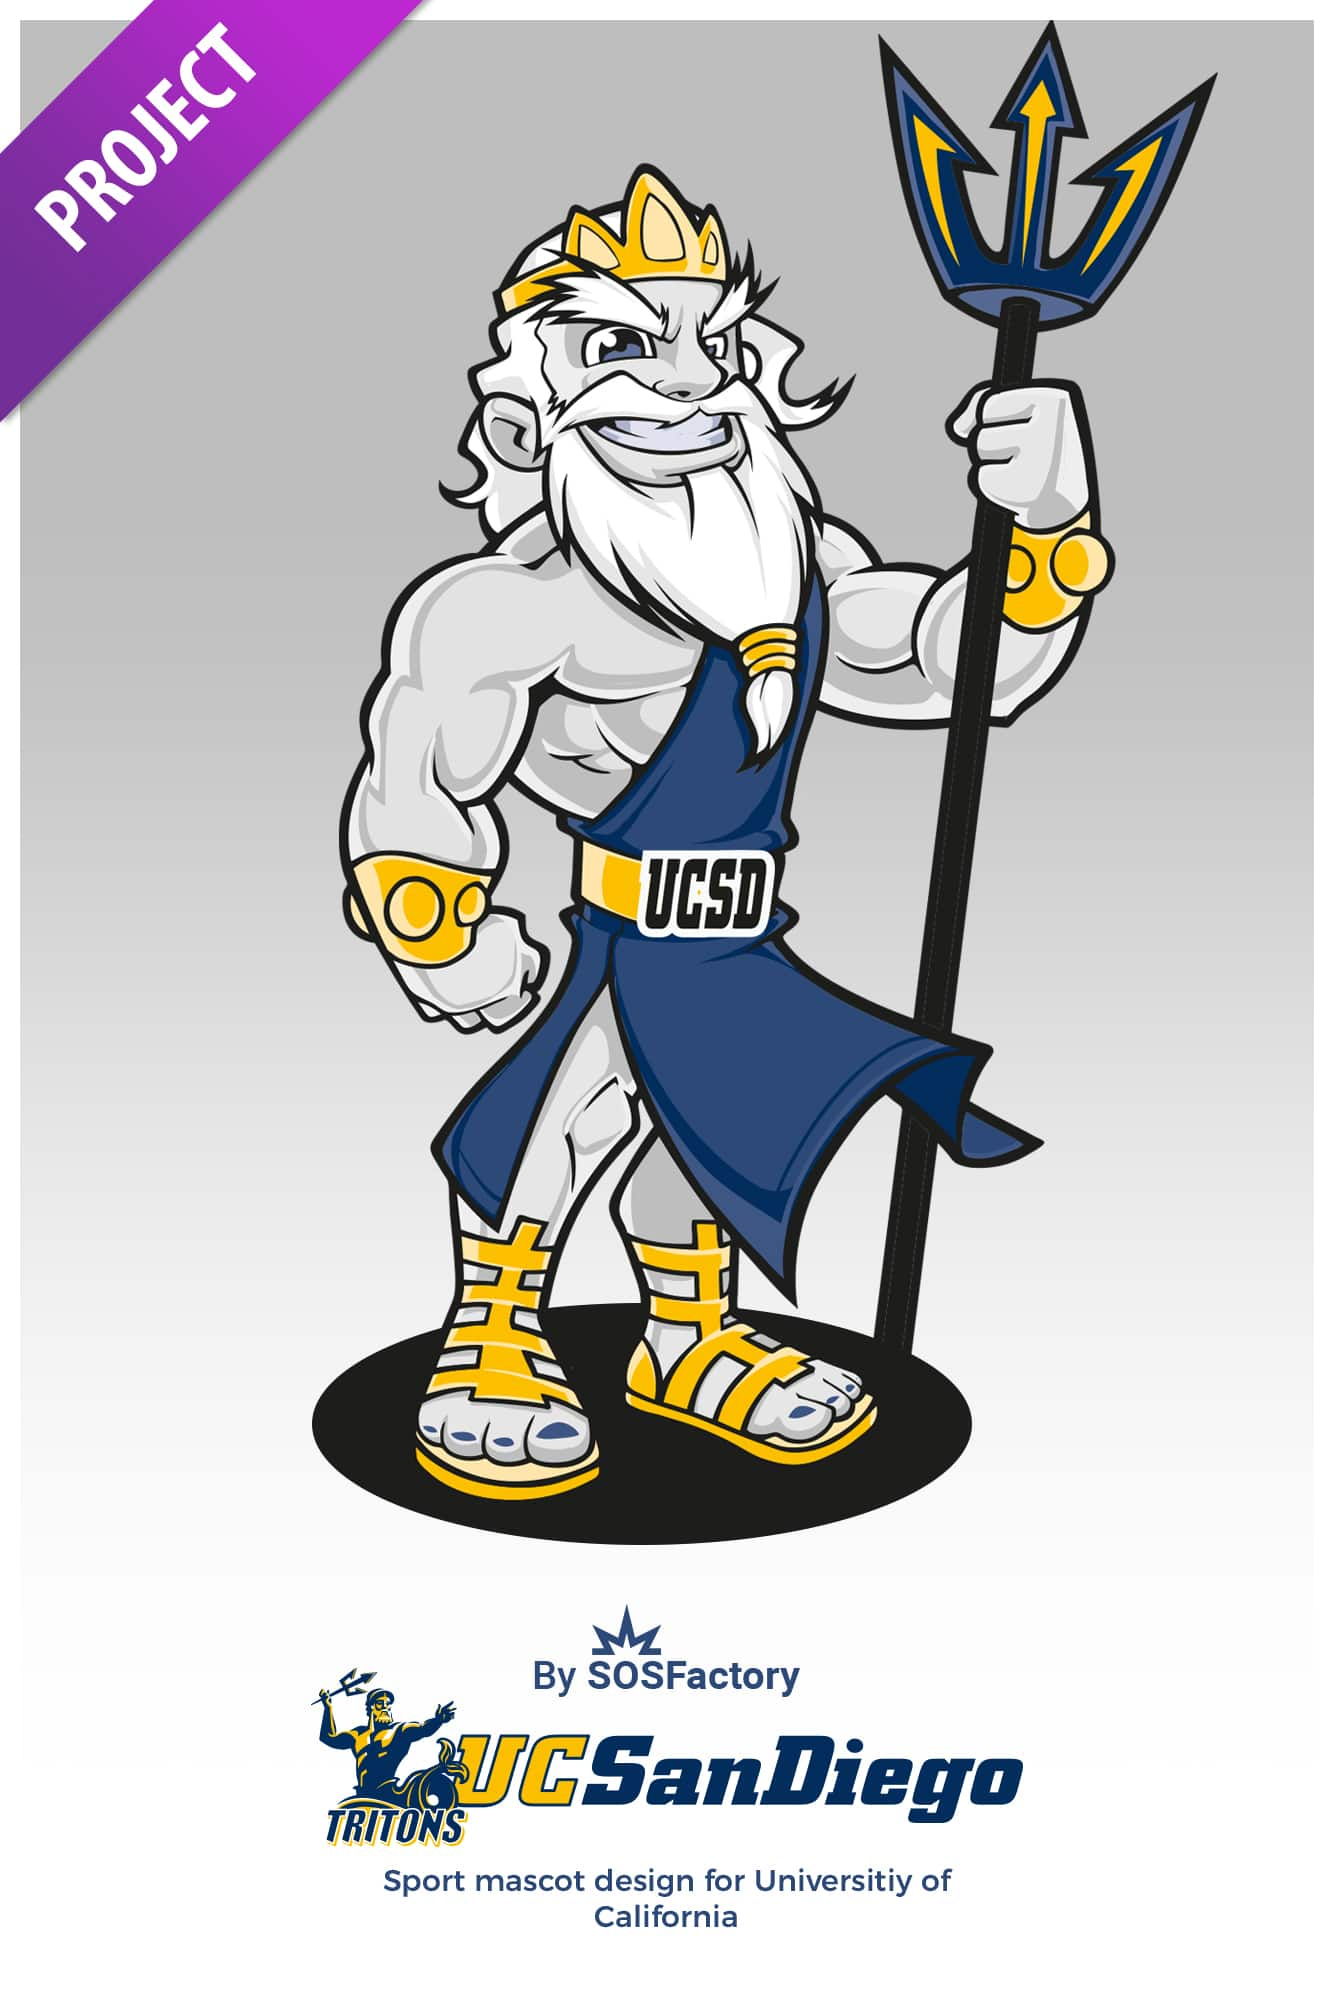 san diego tritons mascot design